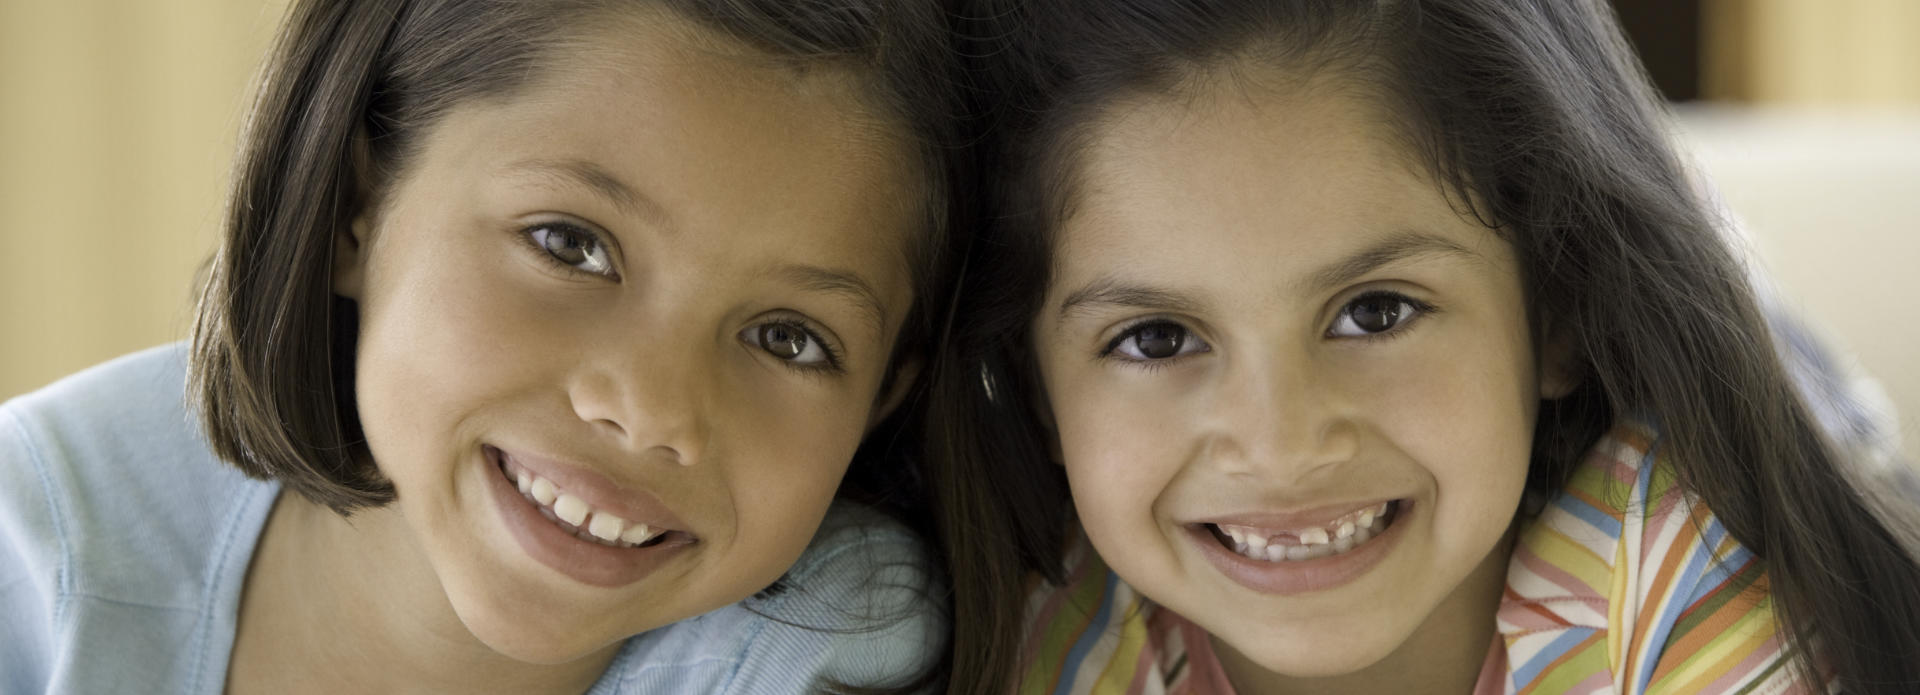 smiling kids, sisters